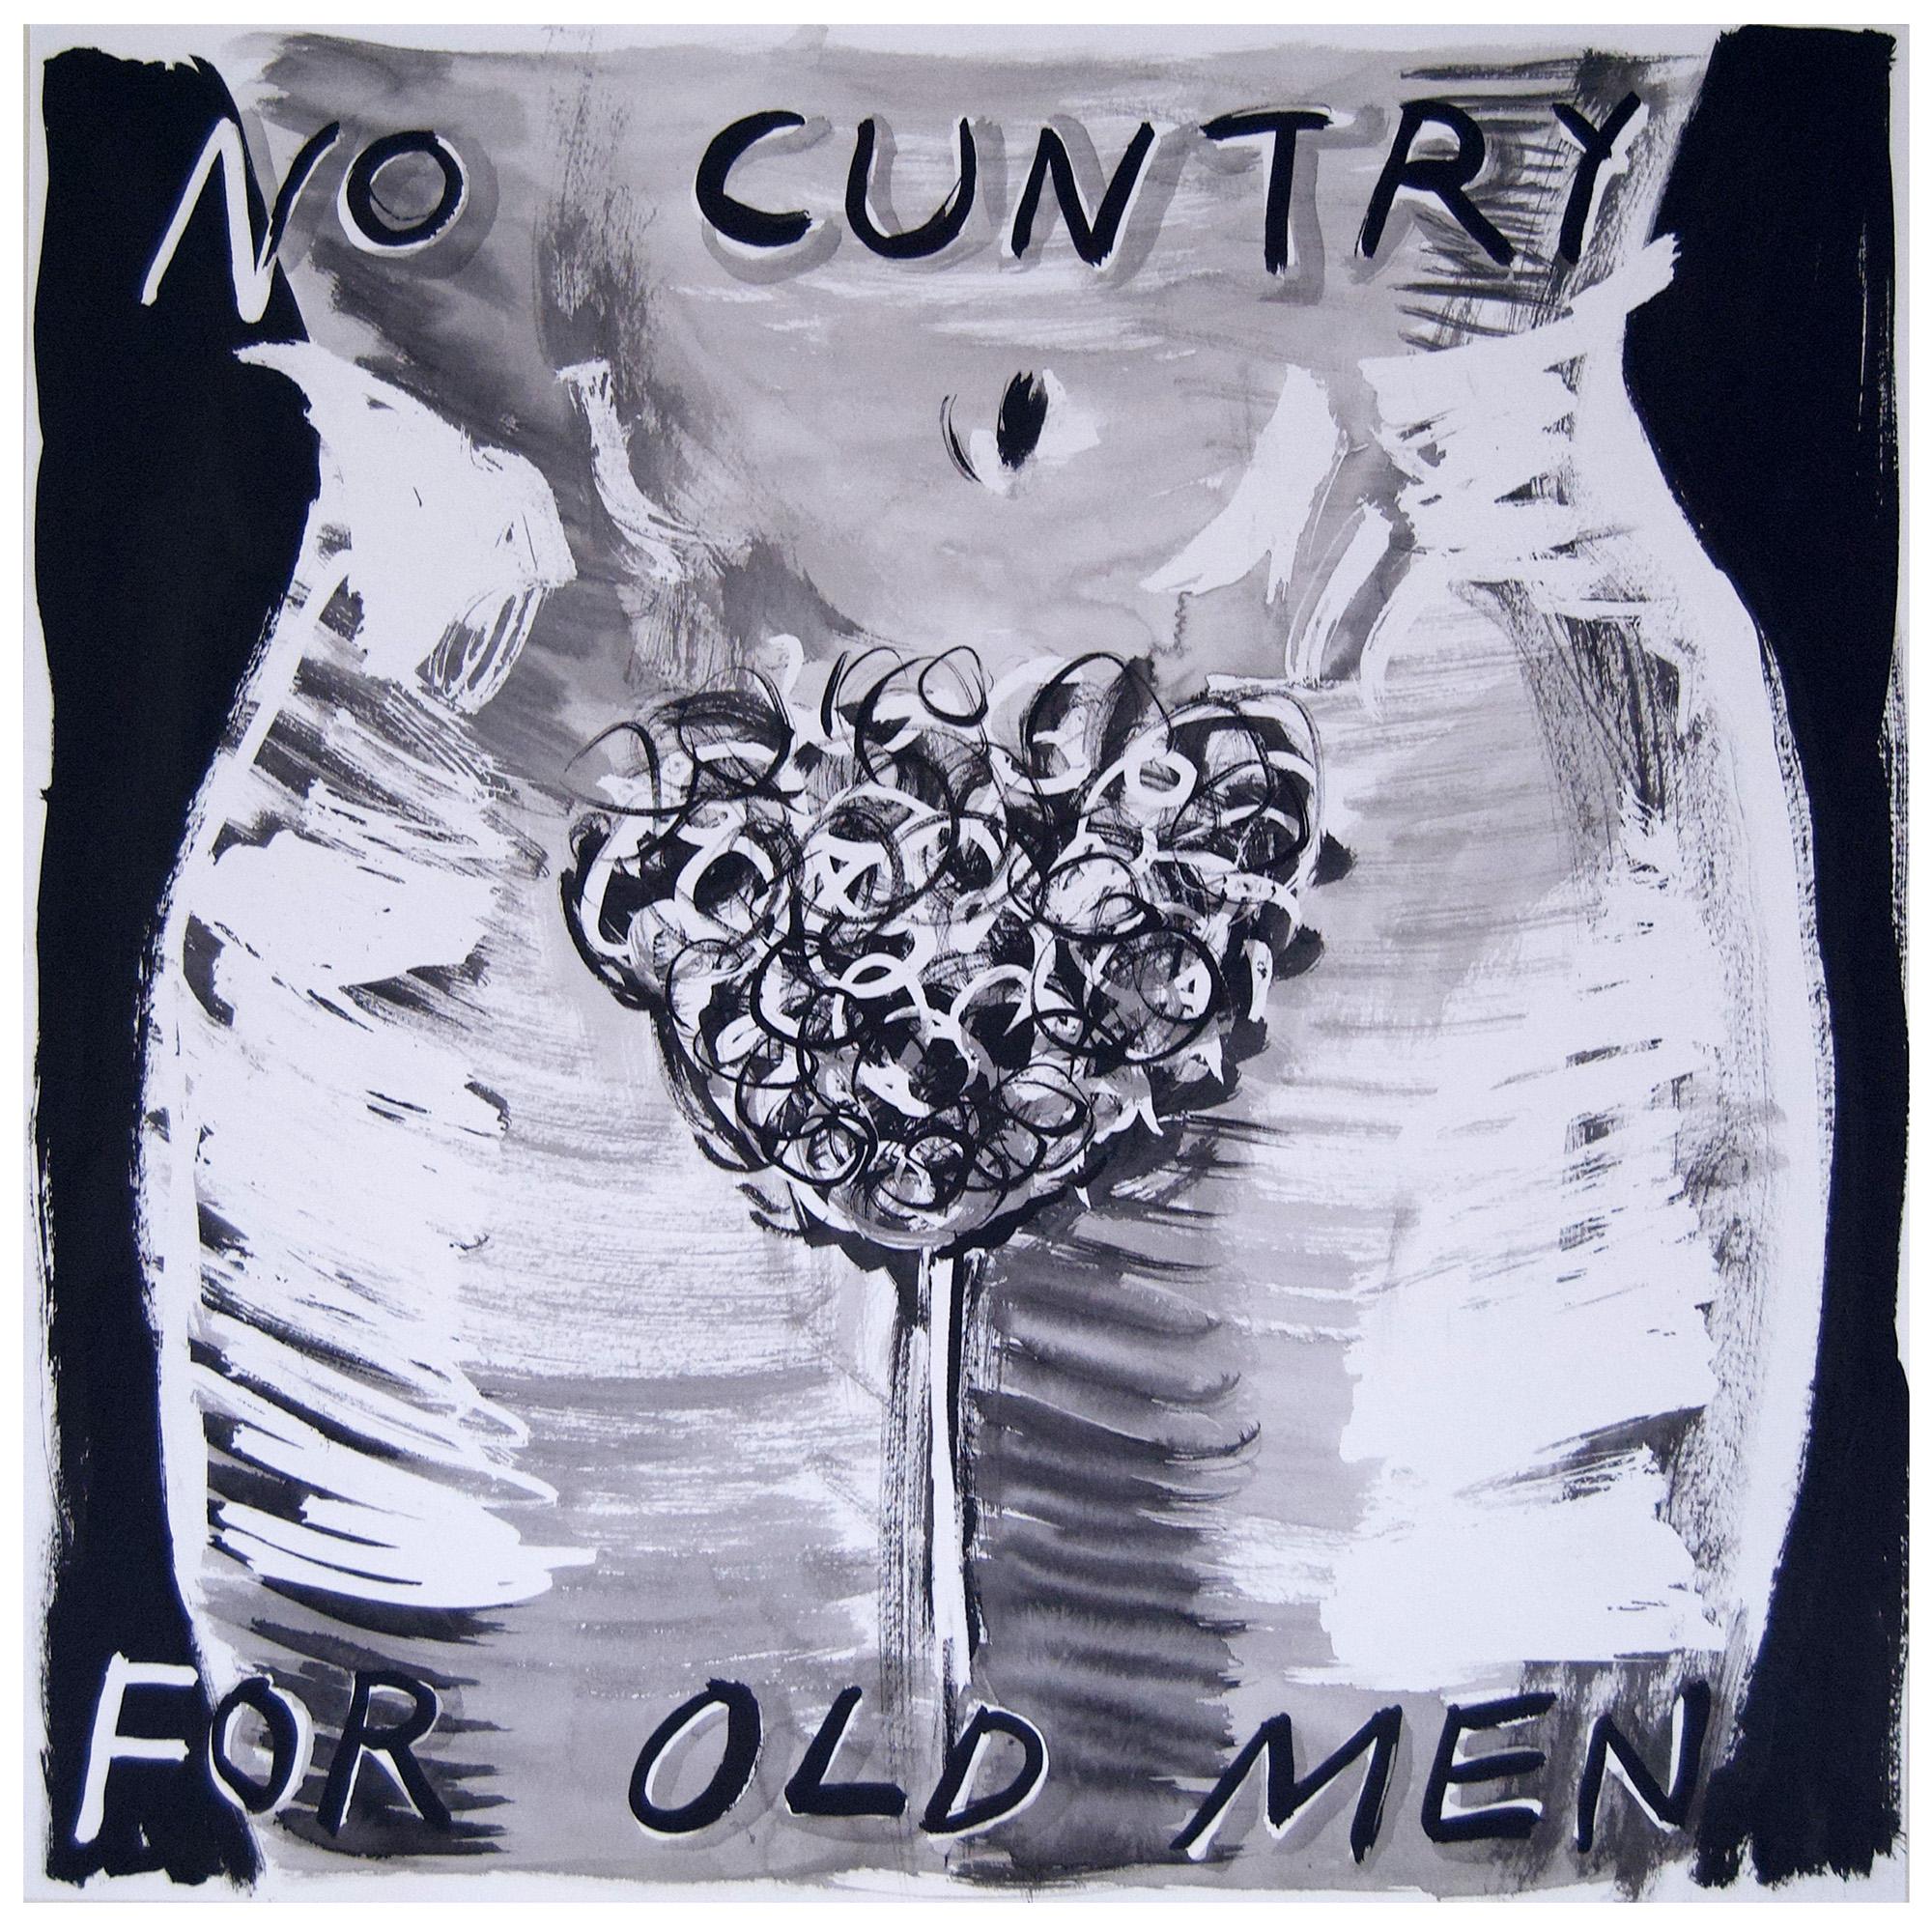 no cuntry for old men.jpg